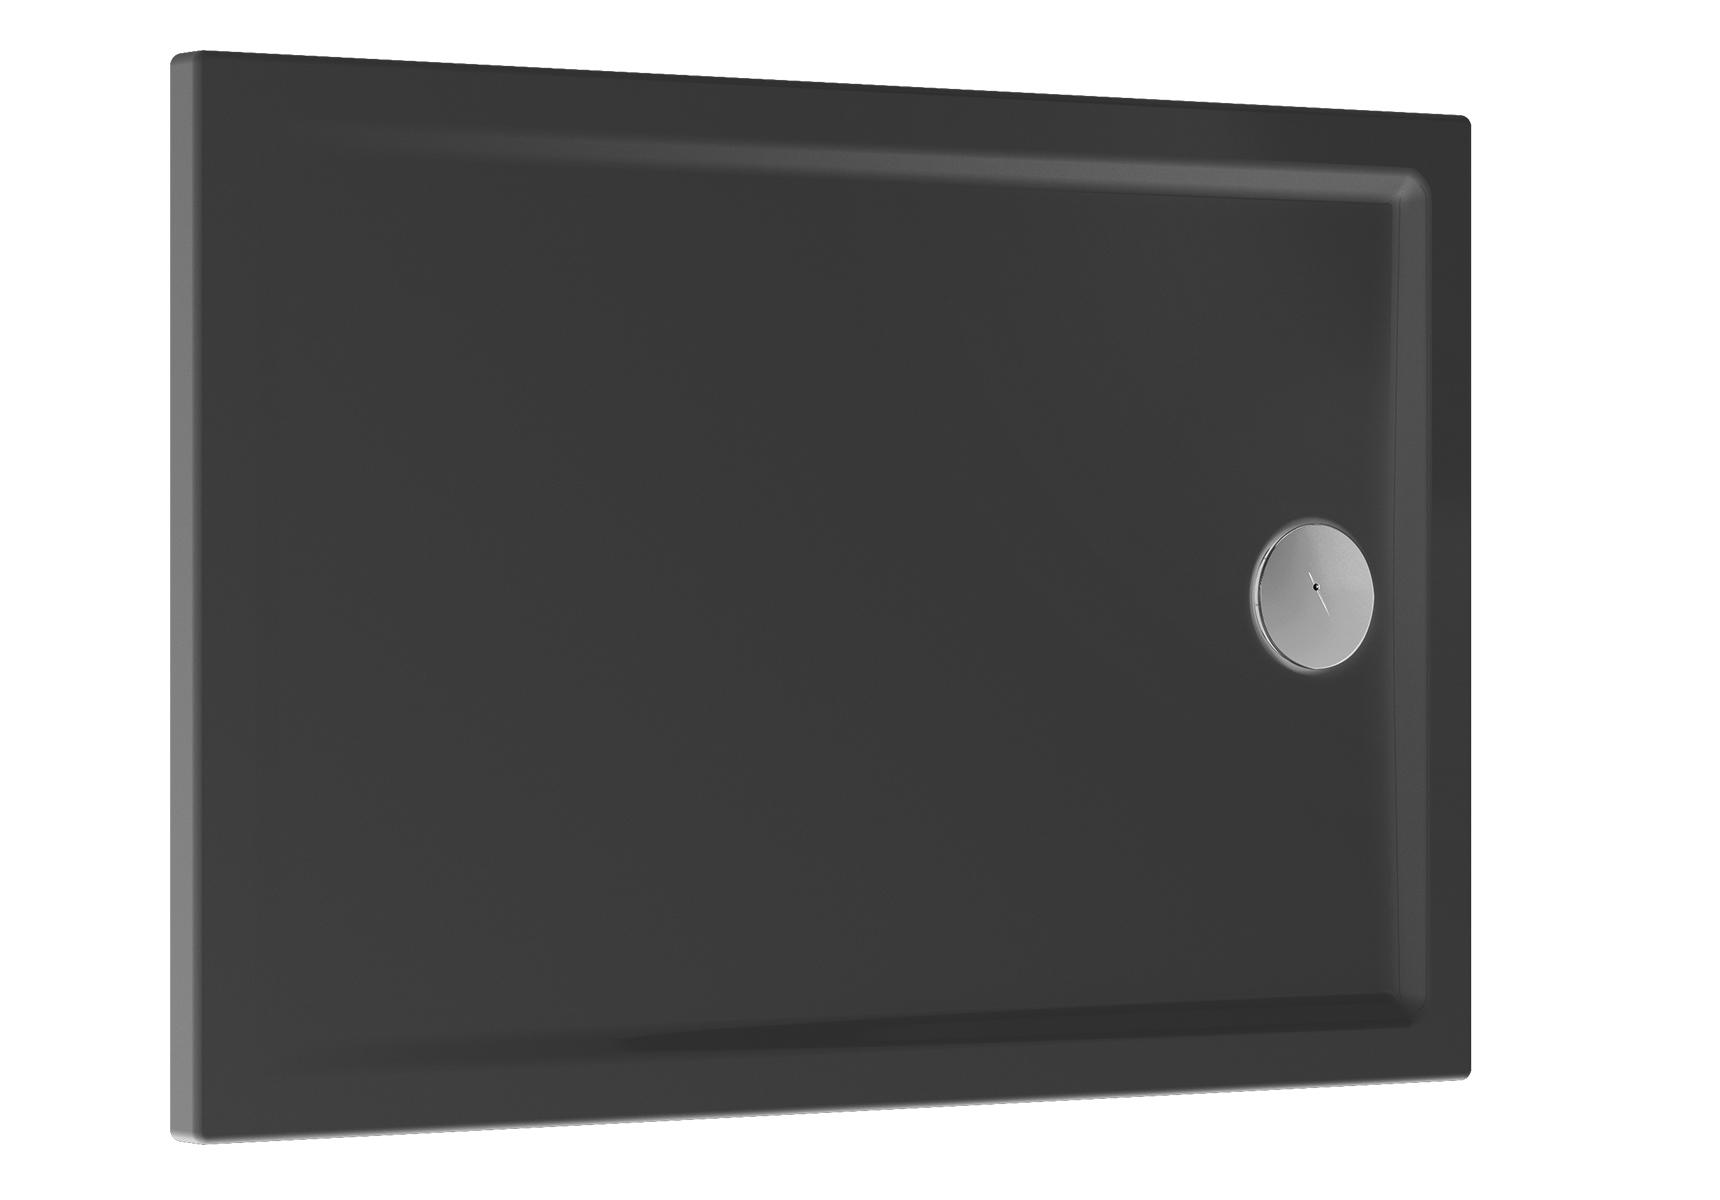 Cascade receveur ultra plat en céramique, 120  x  80 cm, anthraciteacite